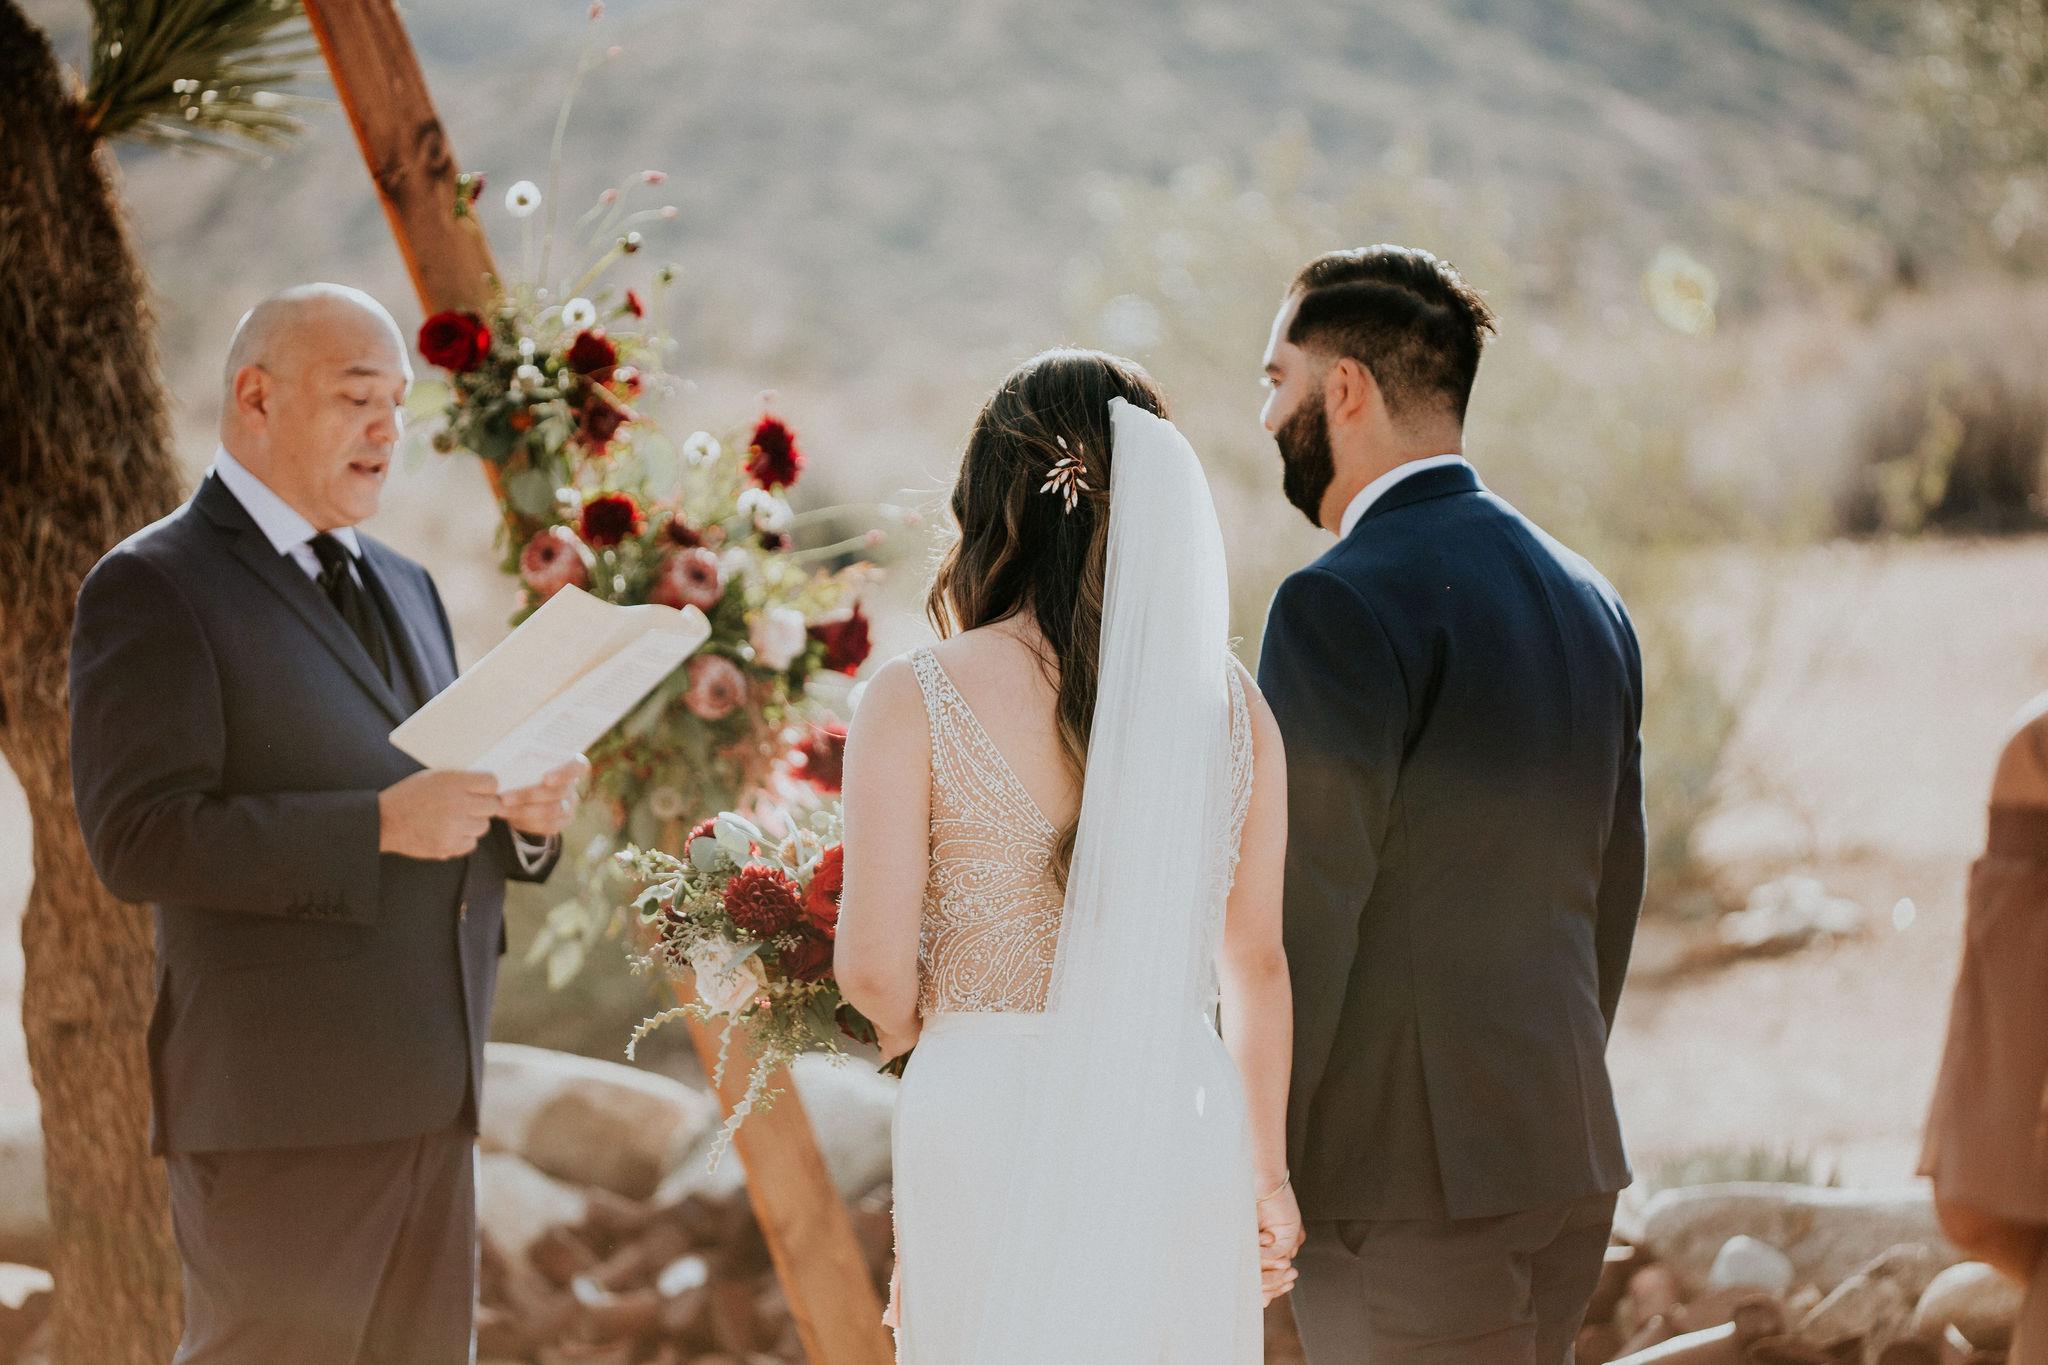 RimrockRanch-JoshuaTree-Wedding-Jami-Laree-332.jpg